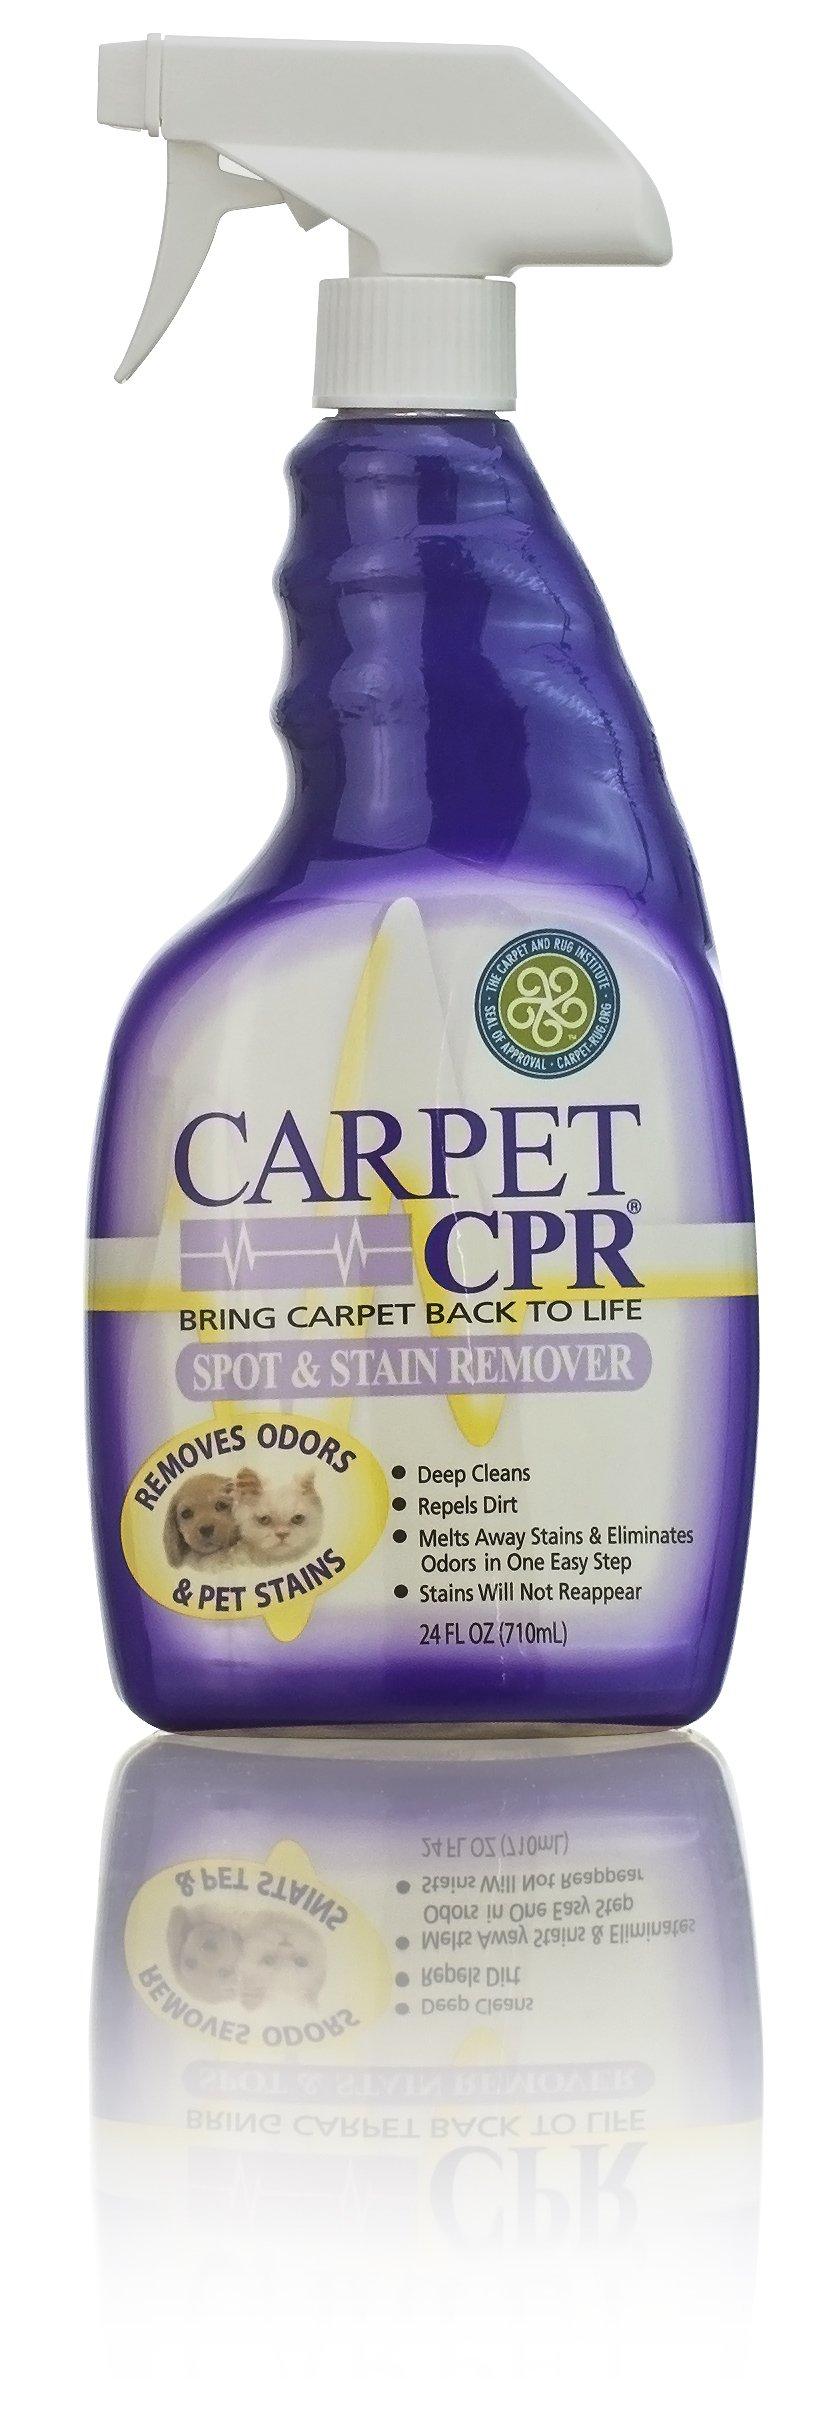 Carpet CPR Spot & Stain Remover, 24-oz